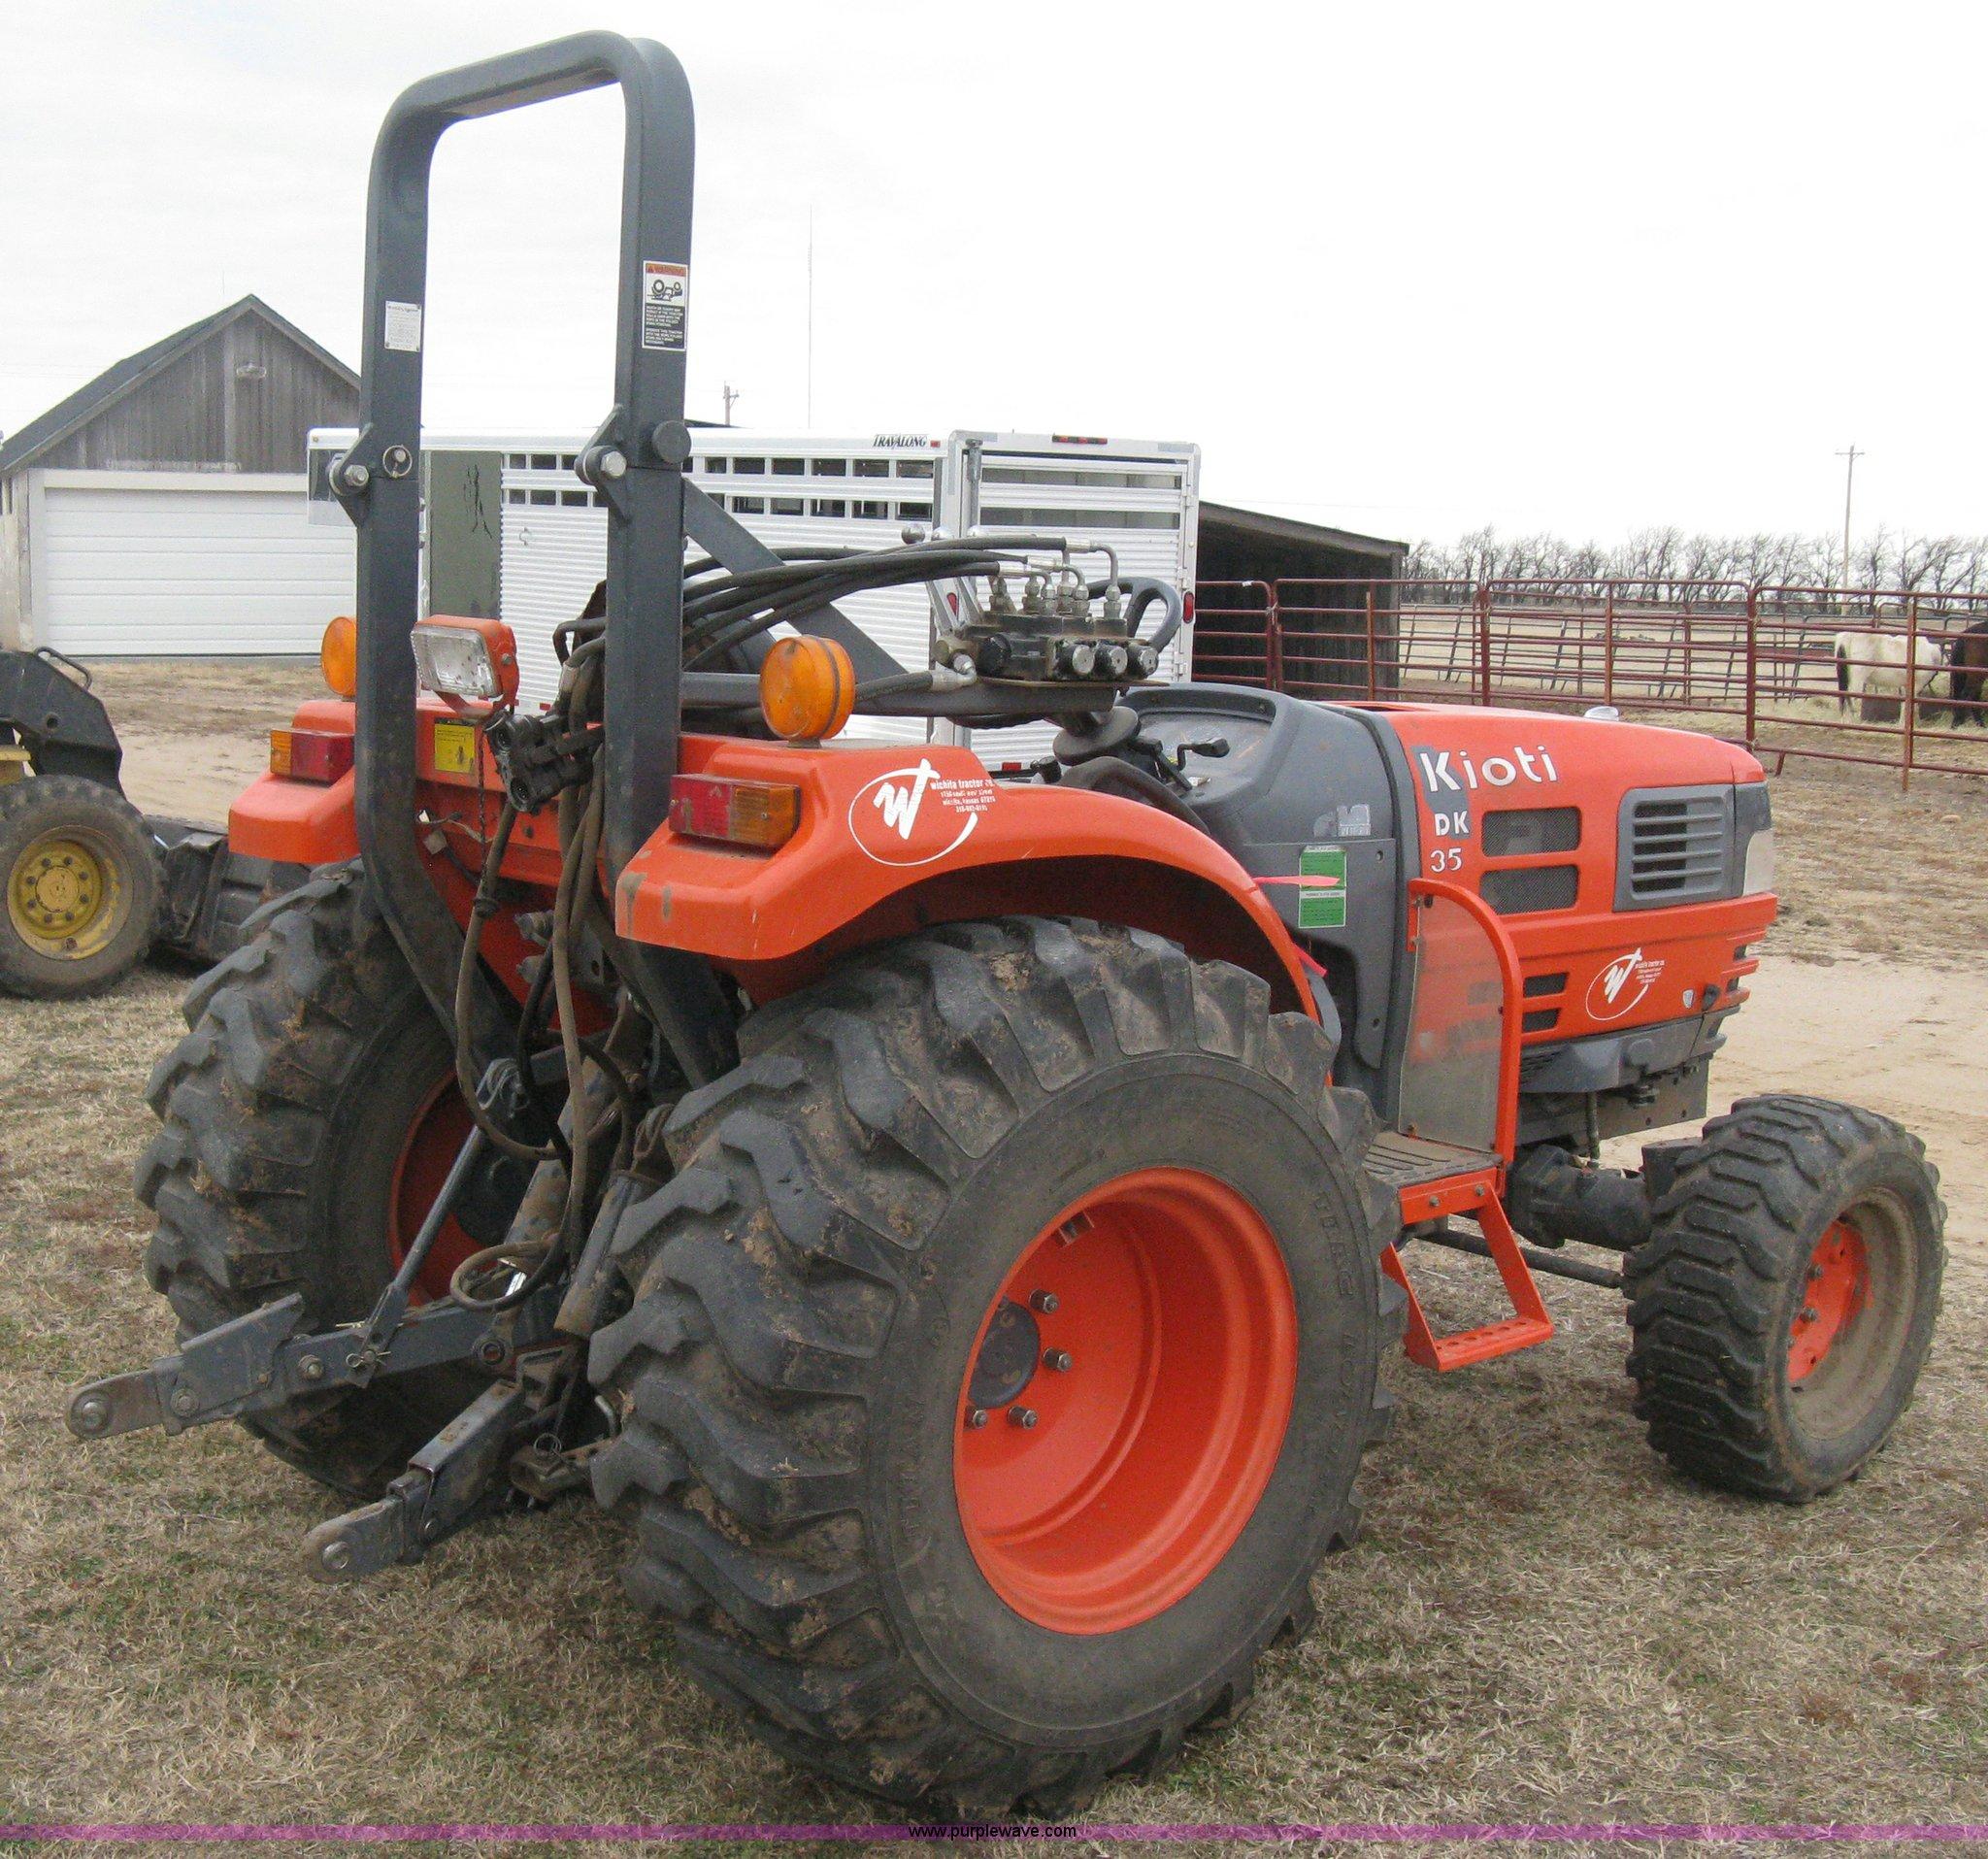 ... Kioti DK35 MFWD tractor Full size in new window ...